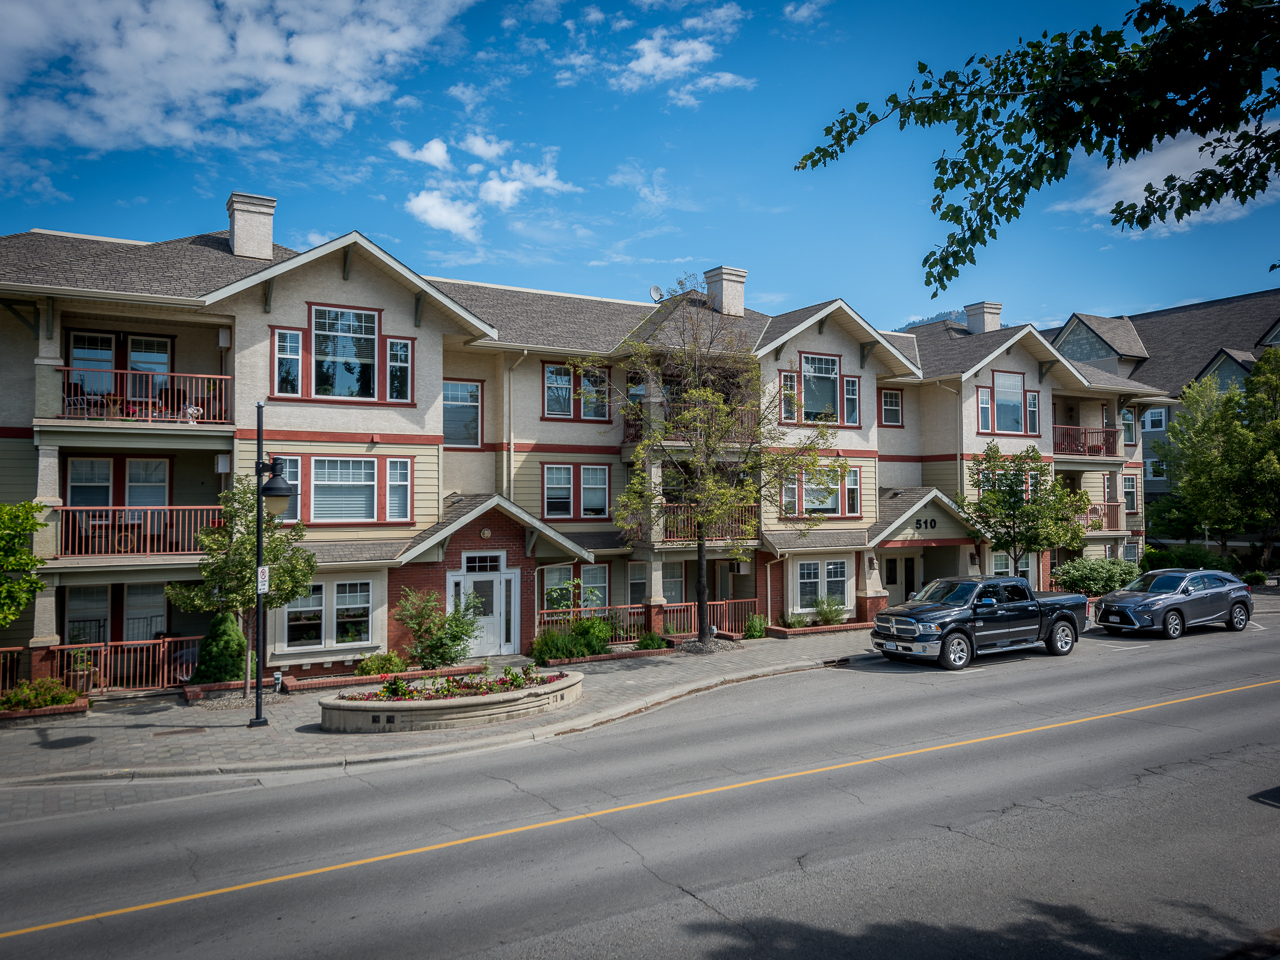 109-510 Lorne St, South Kamloops, Real Estate for Sale